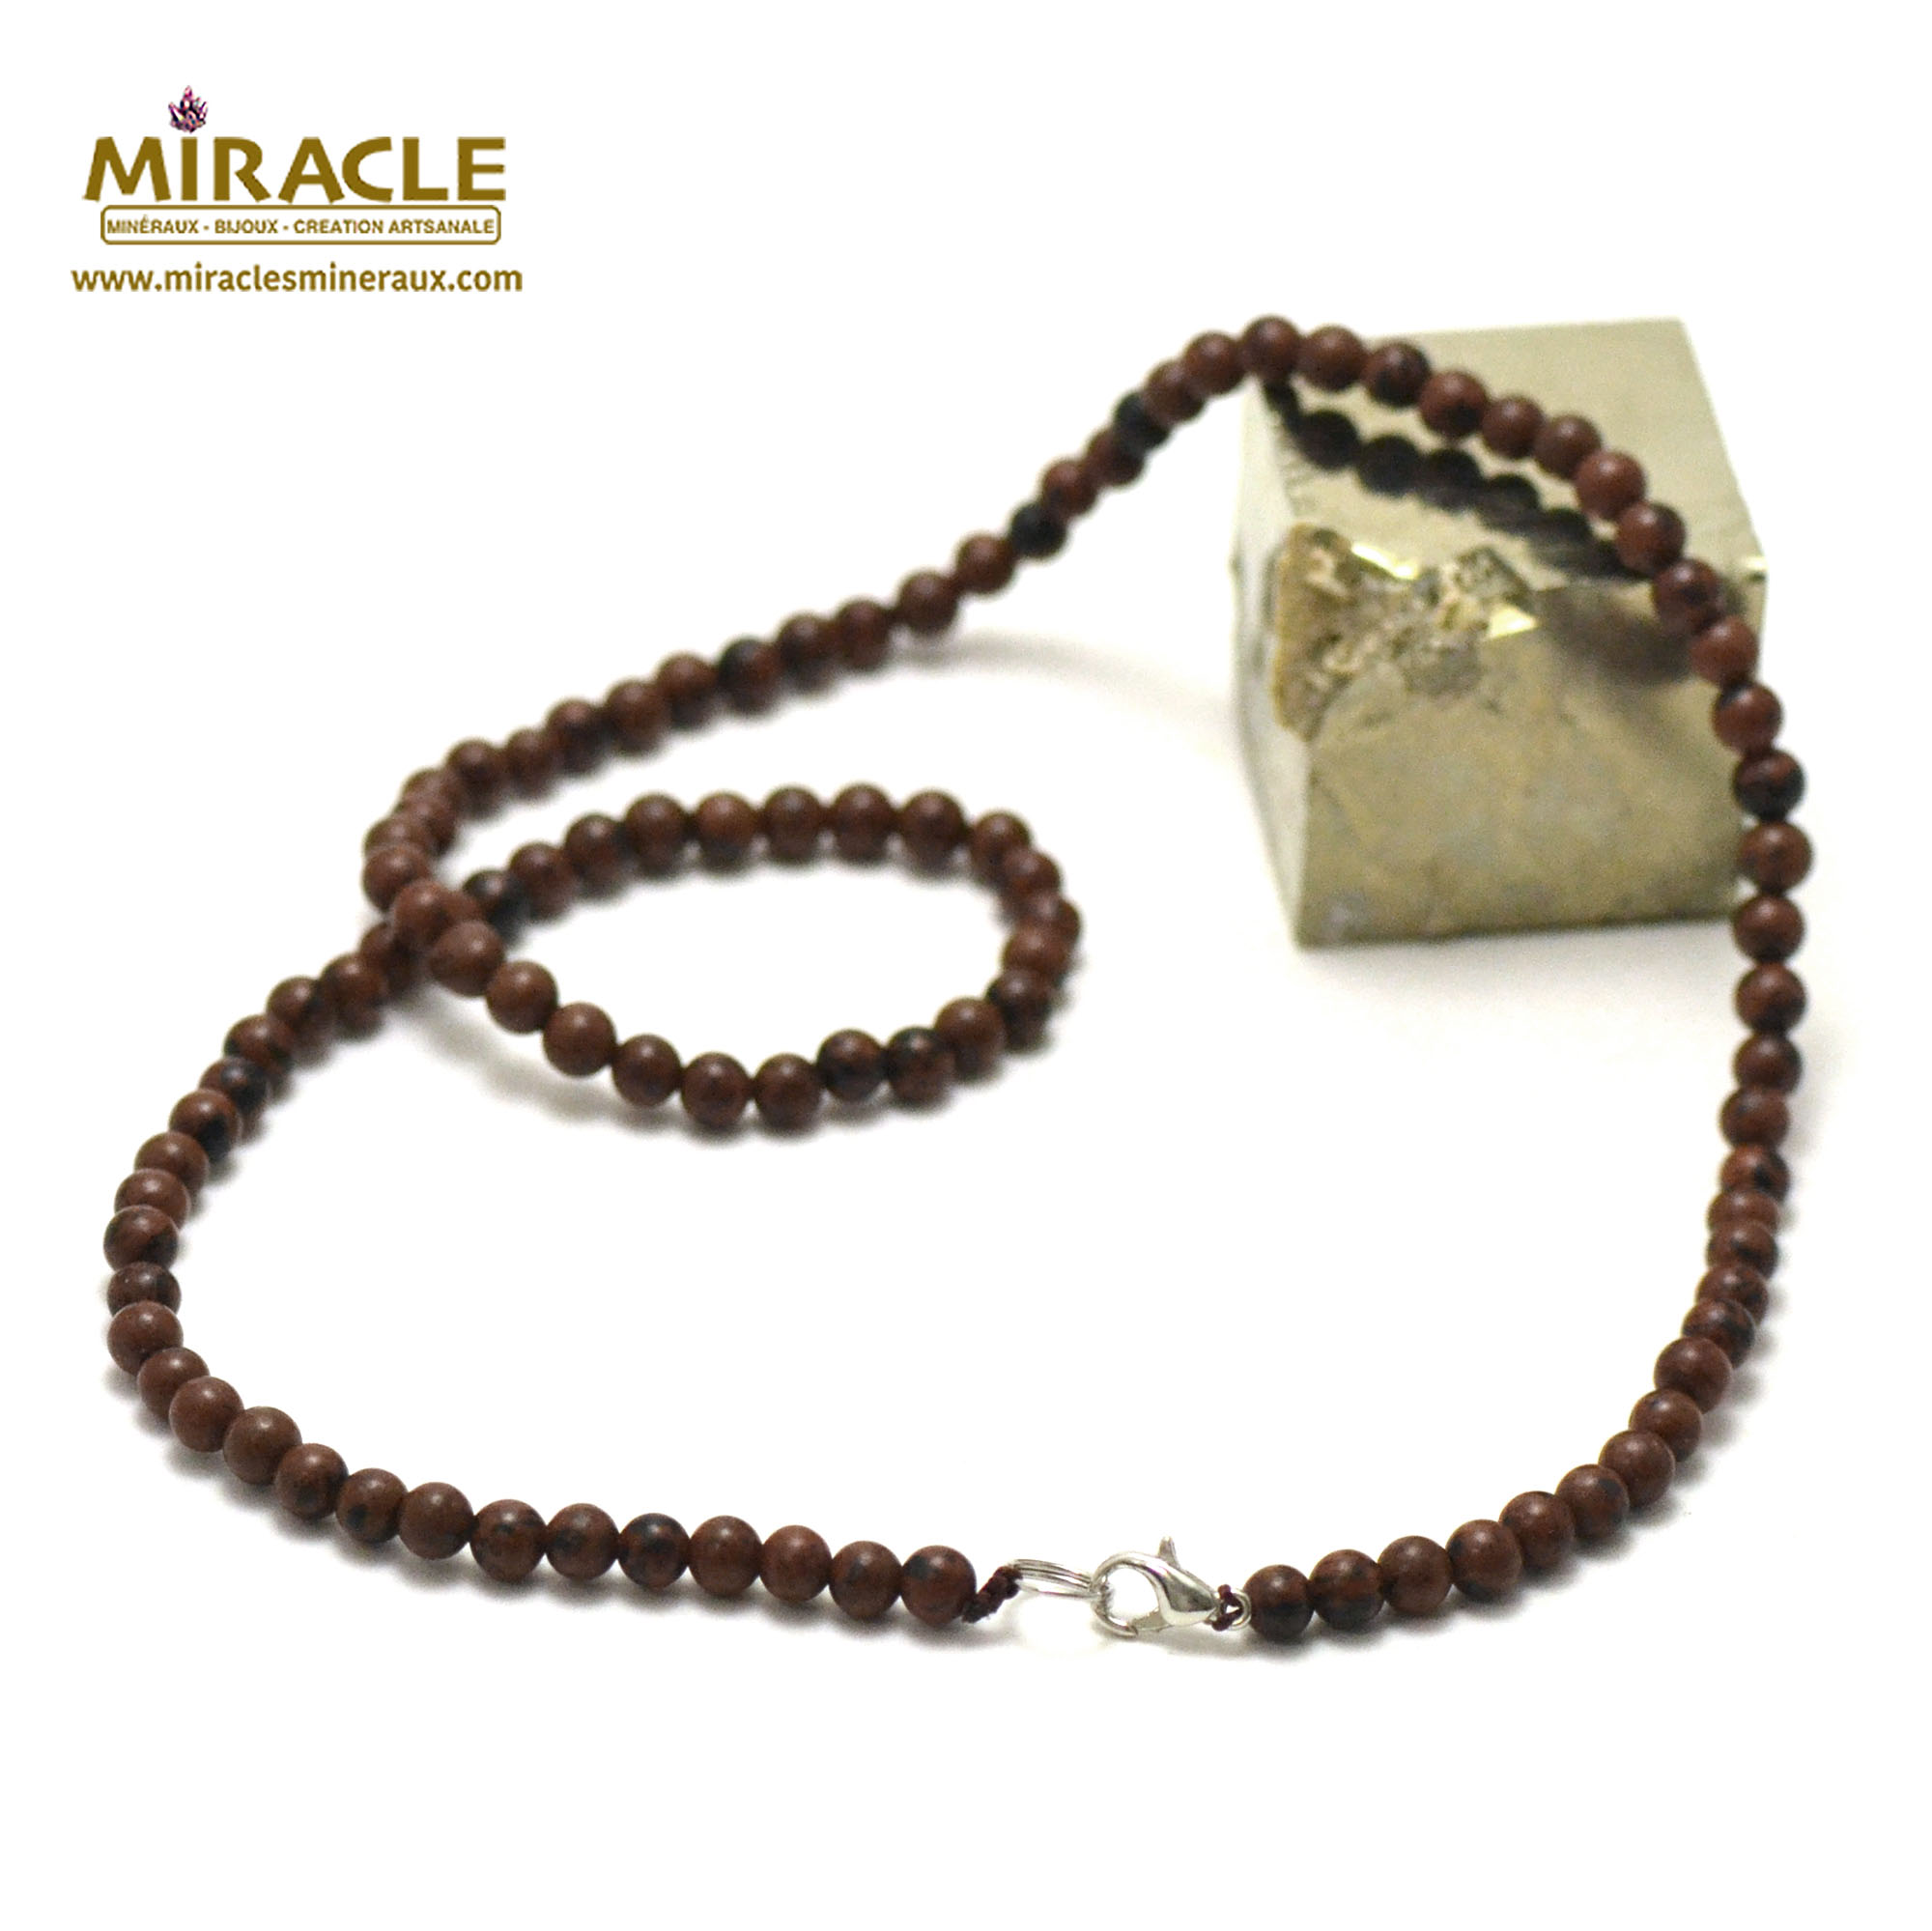 collier obsidienne acajou perle ronde 4 mm